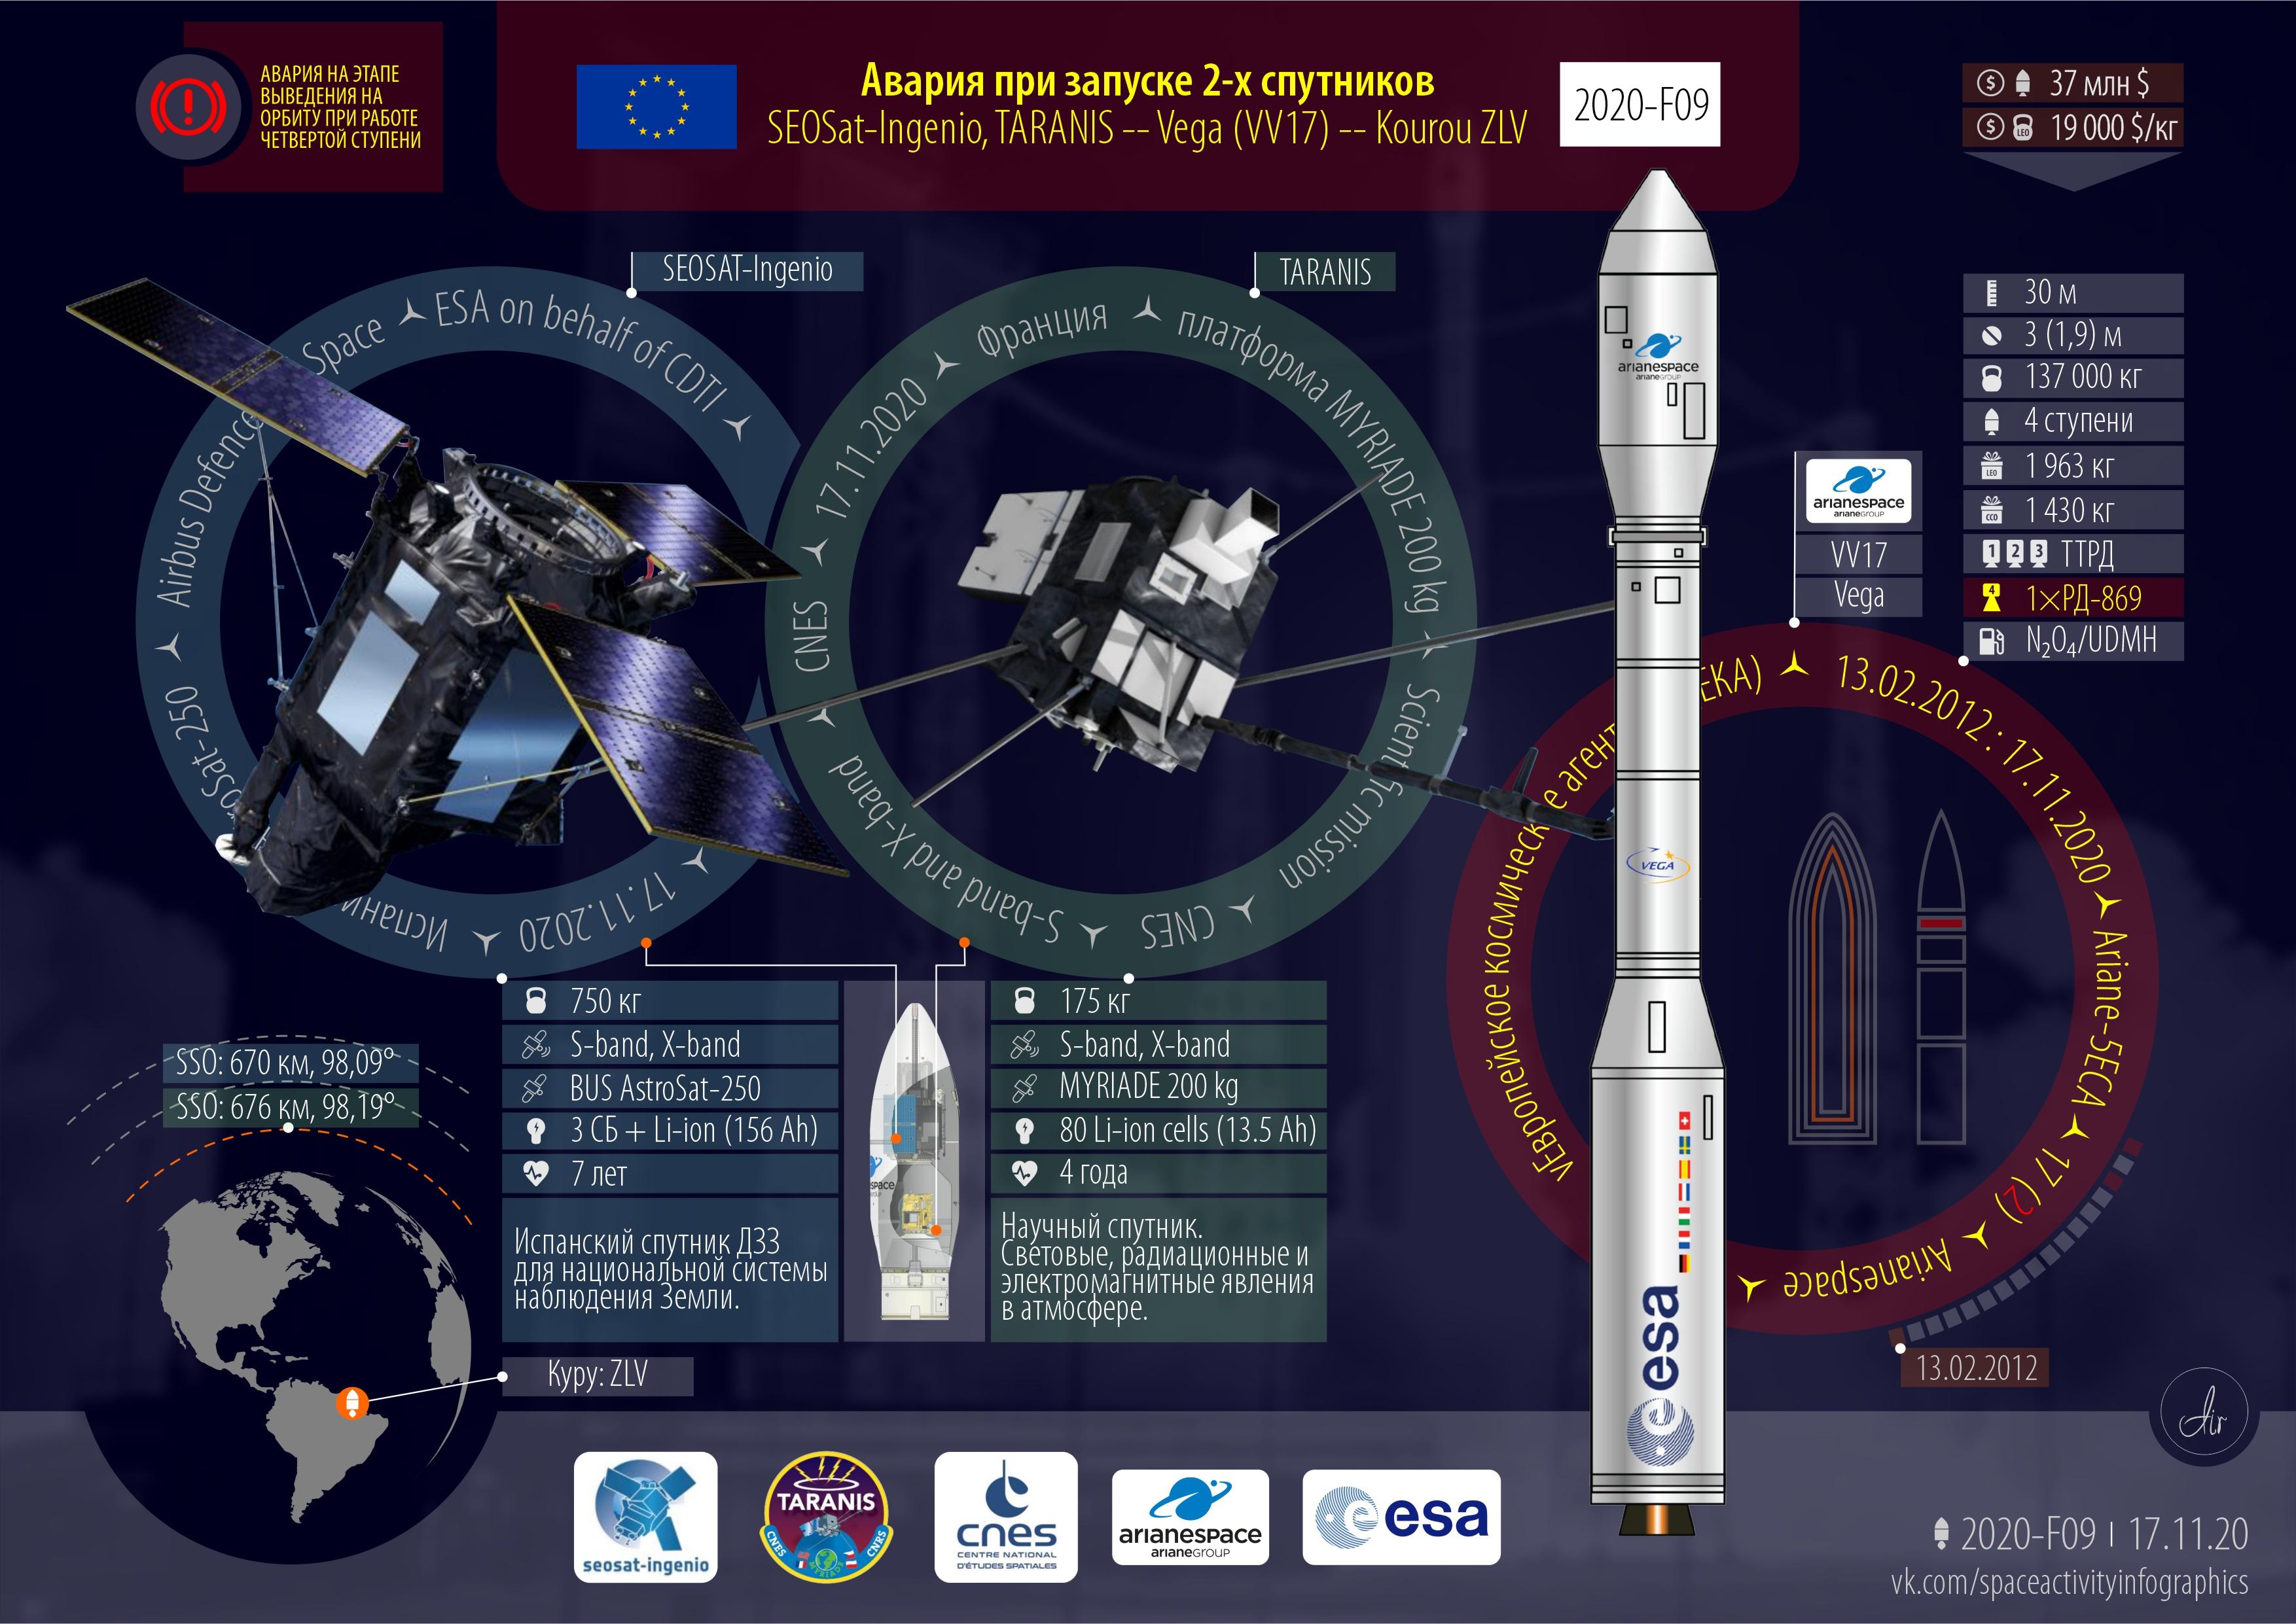 Vega | SEOSAT-Ingenio&Taranis